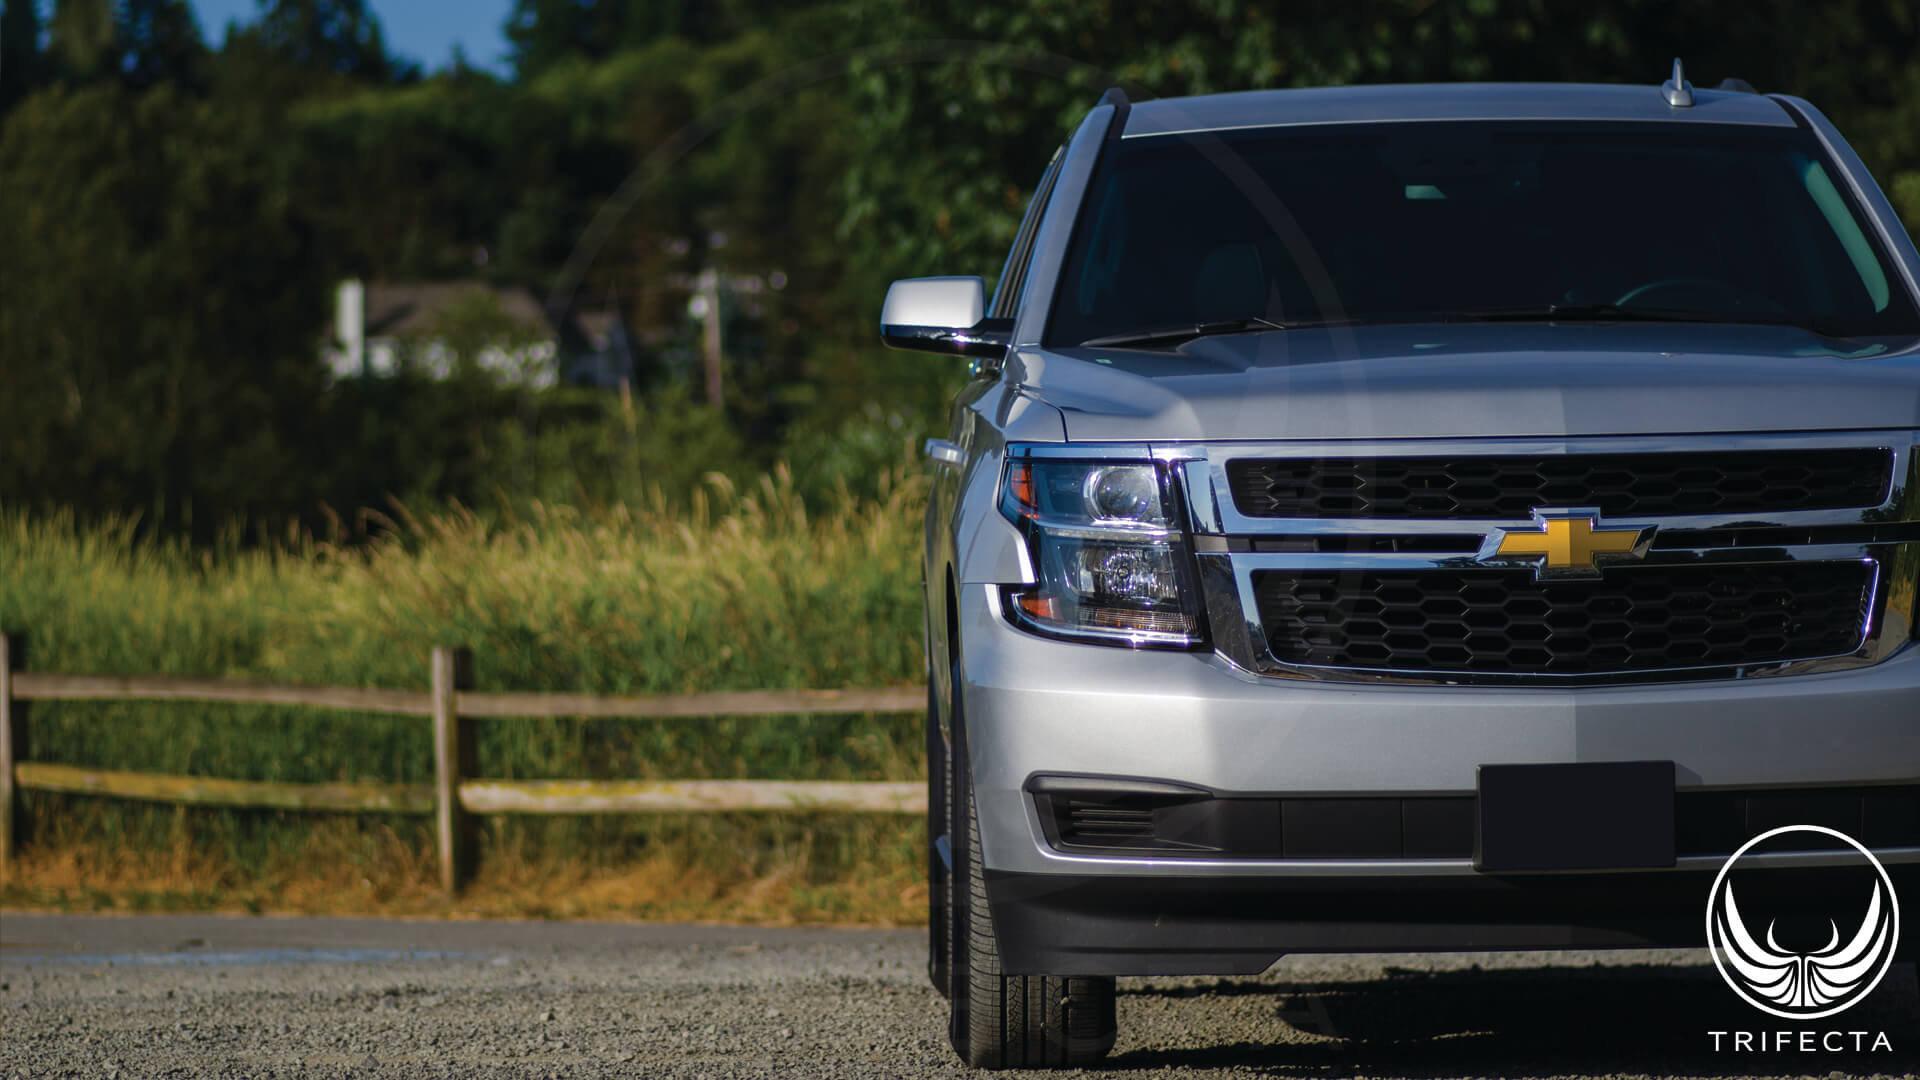 Product Review: 2015--2017+ Chevrolet Tahoe - 5.3L - Elite